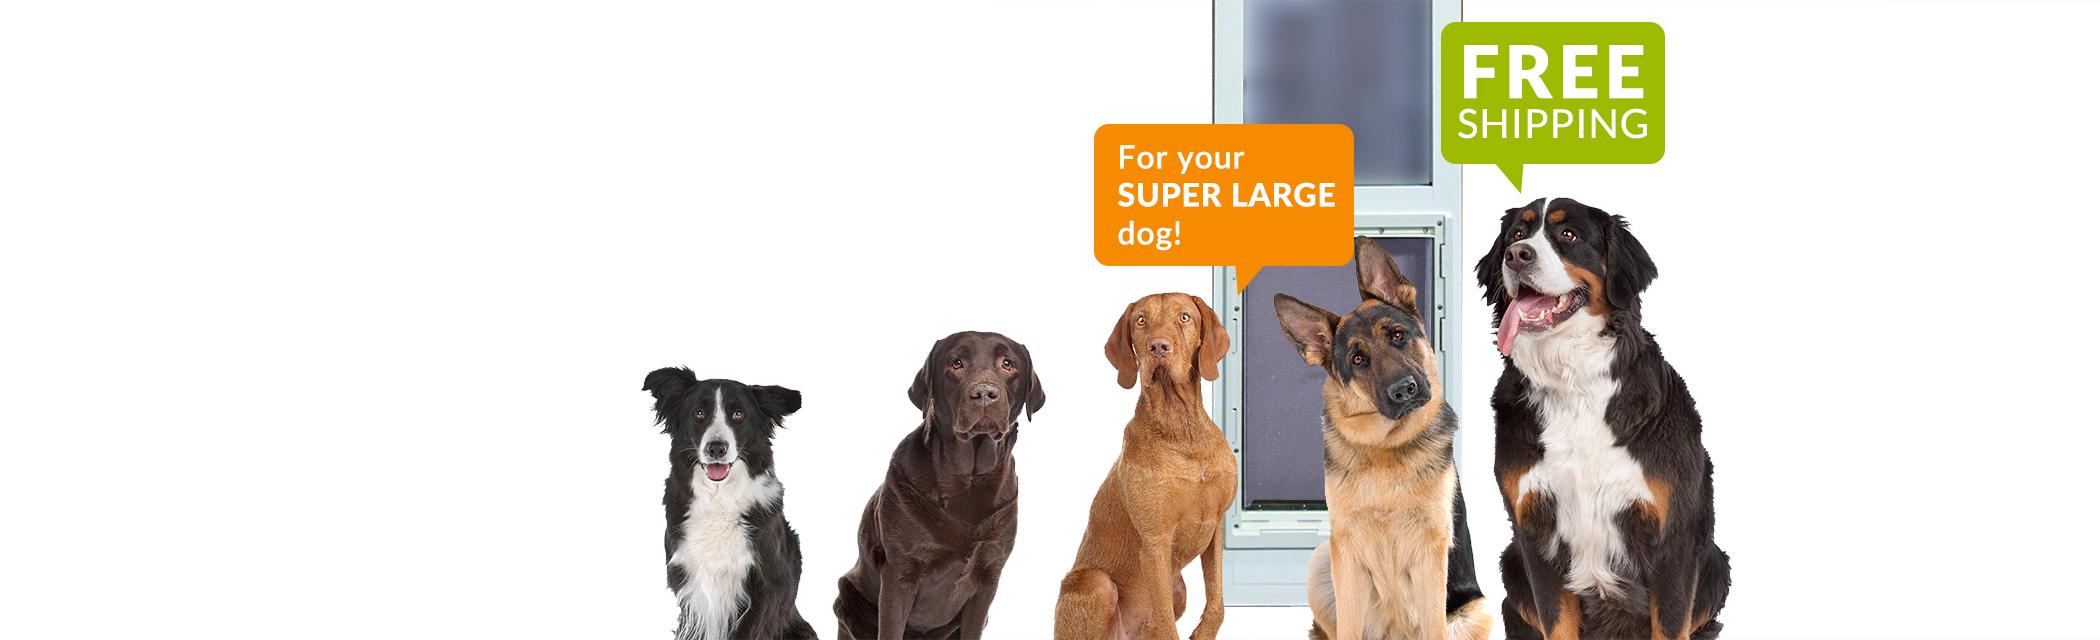 Ideal Pet Products Dog Doors Cat Doors Pet Accessories And